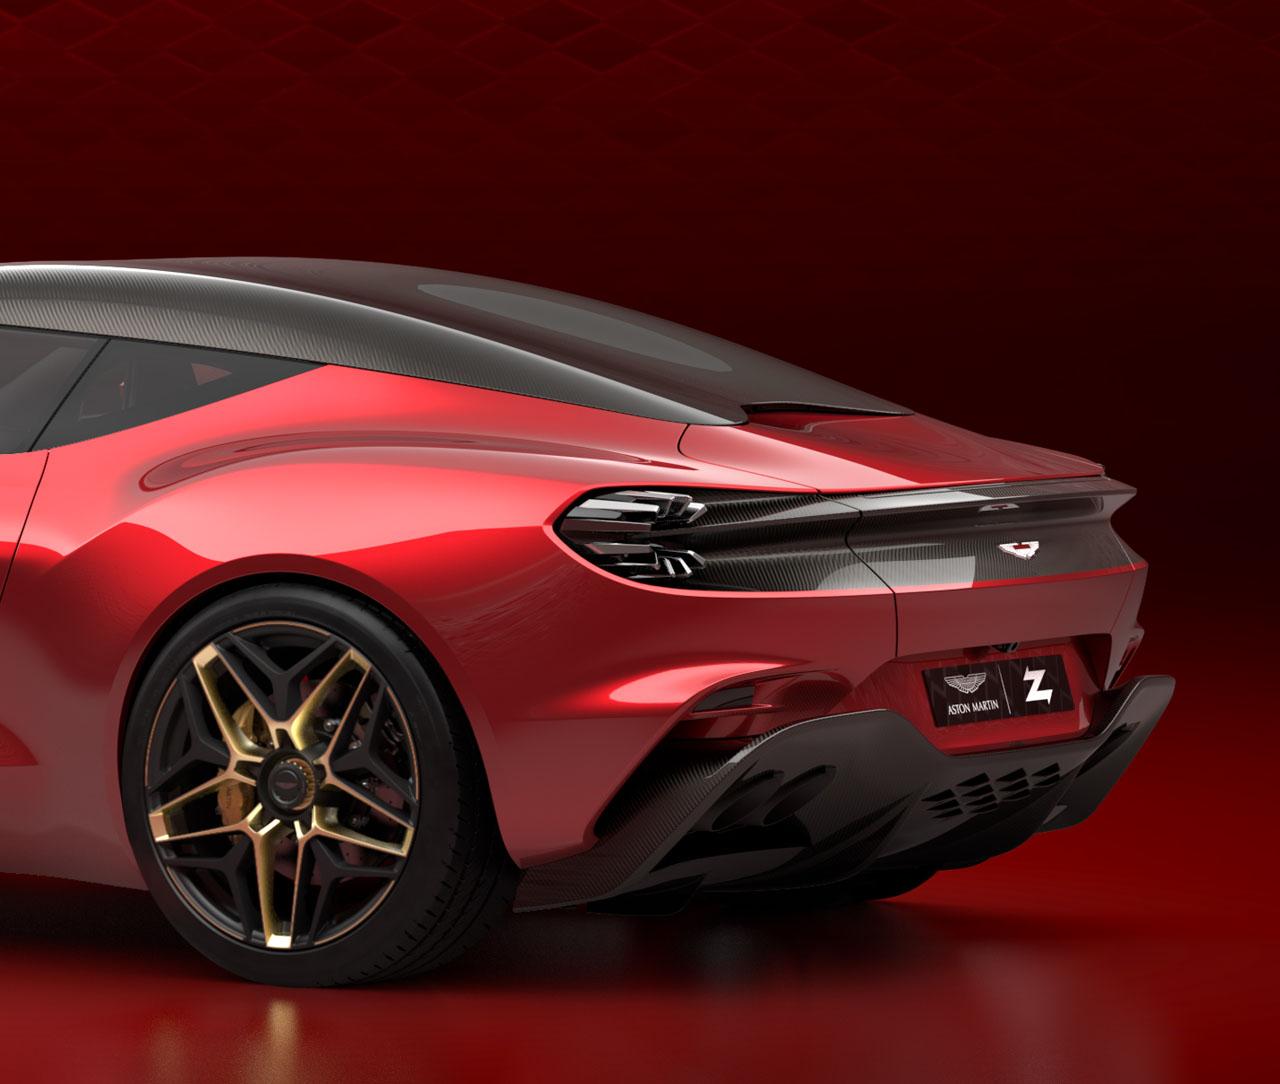 Aston Martin Reveals 2020 DBS GT Zagato